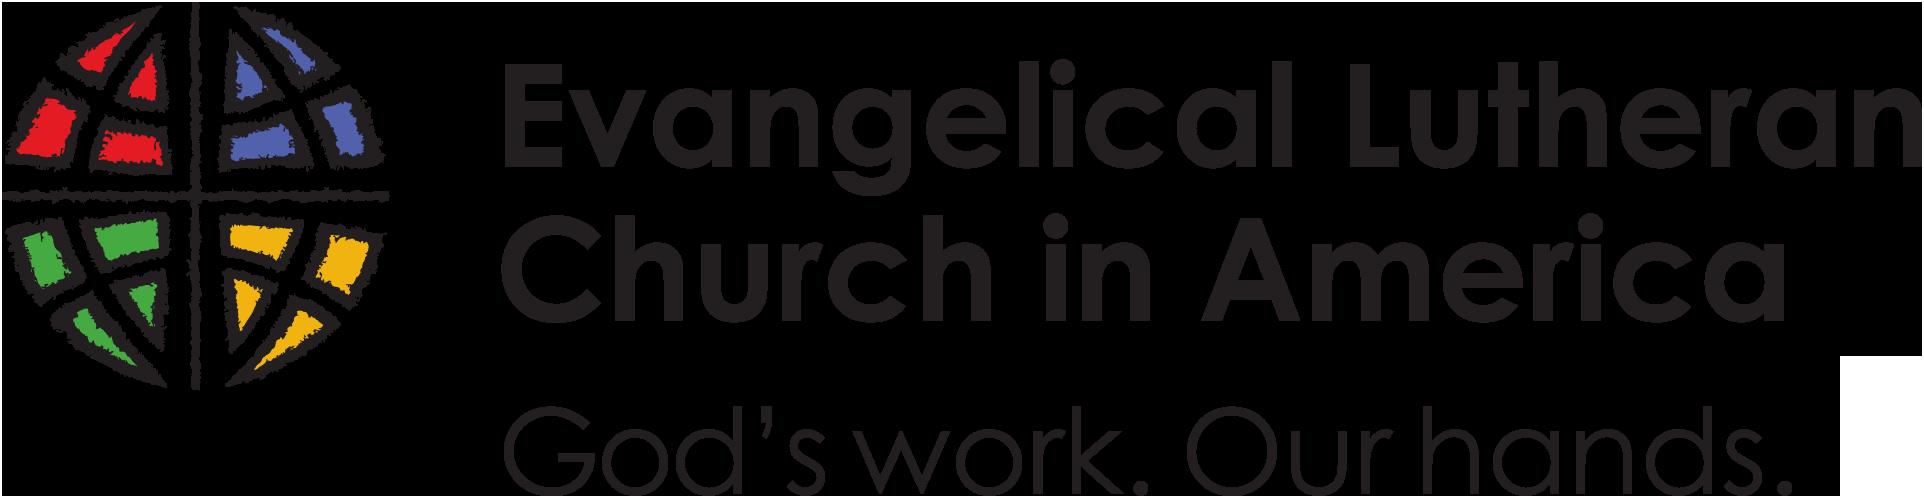 Evangelical Lutheran Church in America Brandmark.png